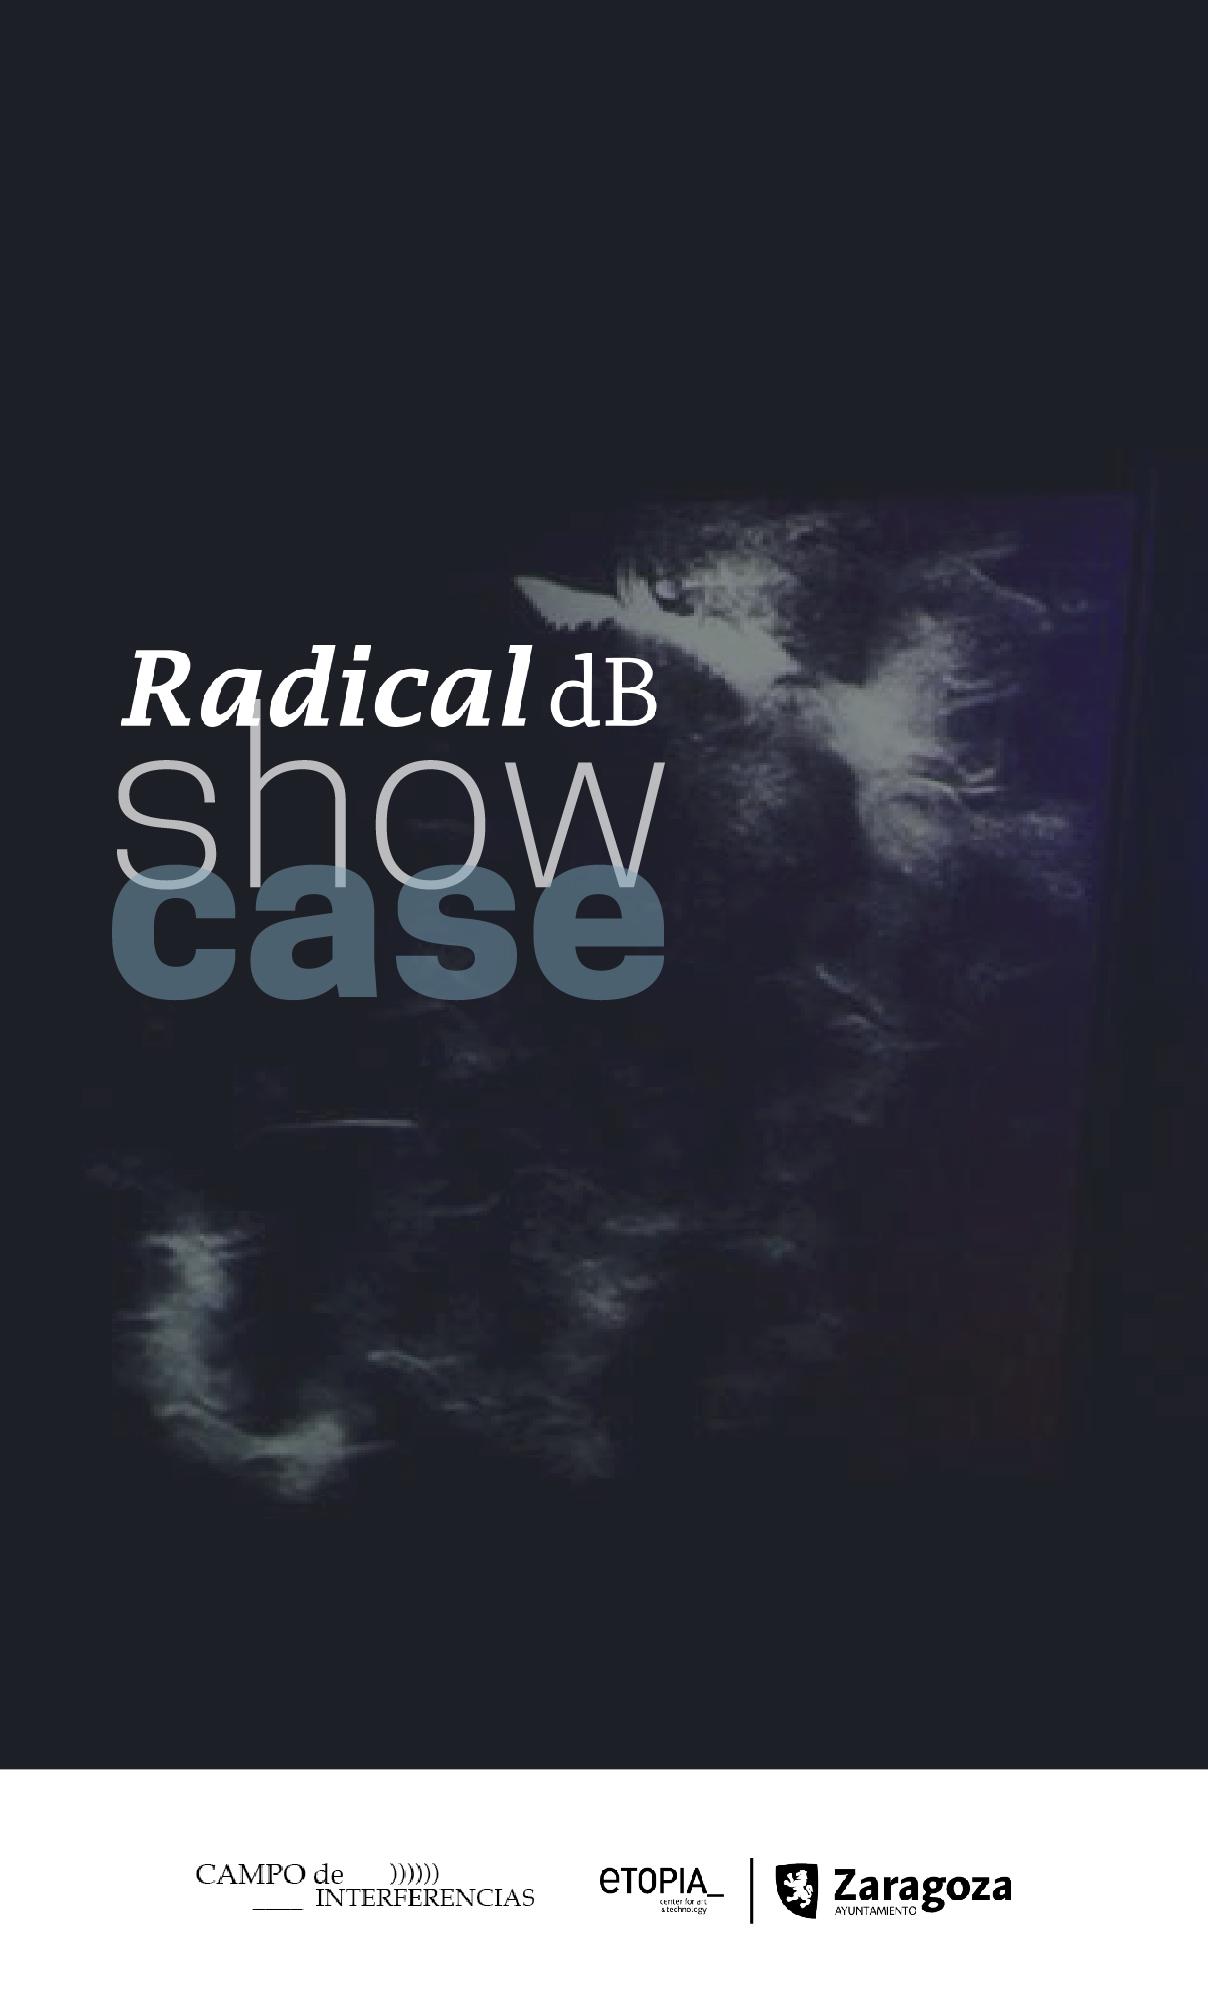 Radical dB Showcase 17-18 de febrero 2017